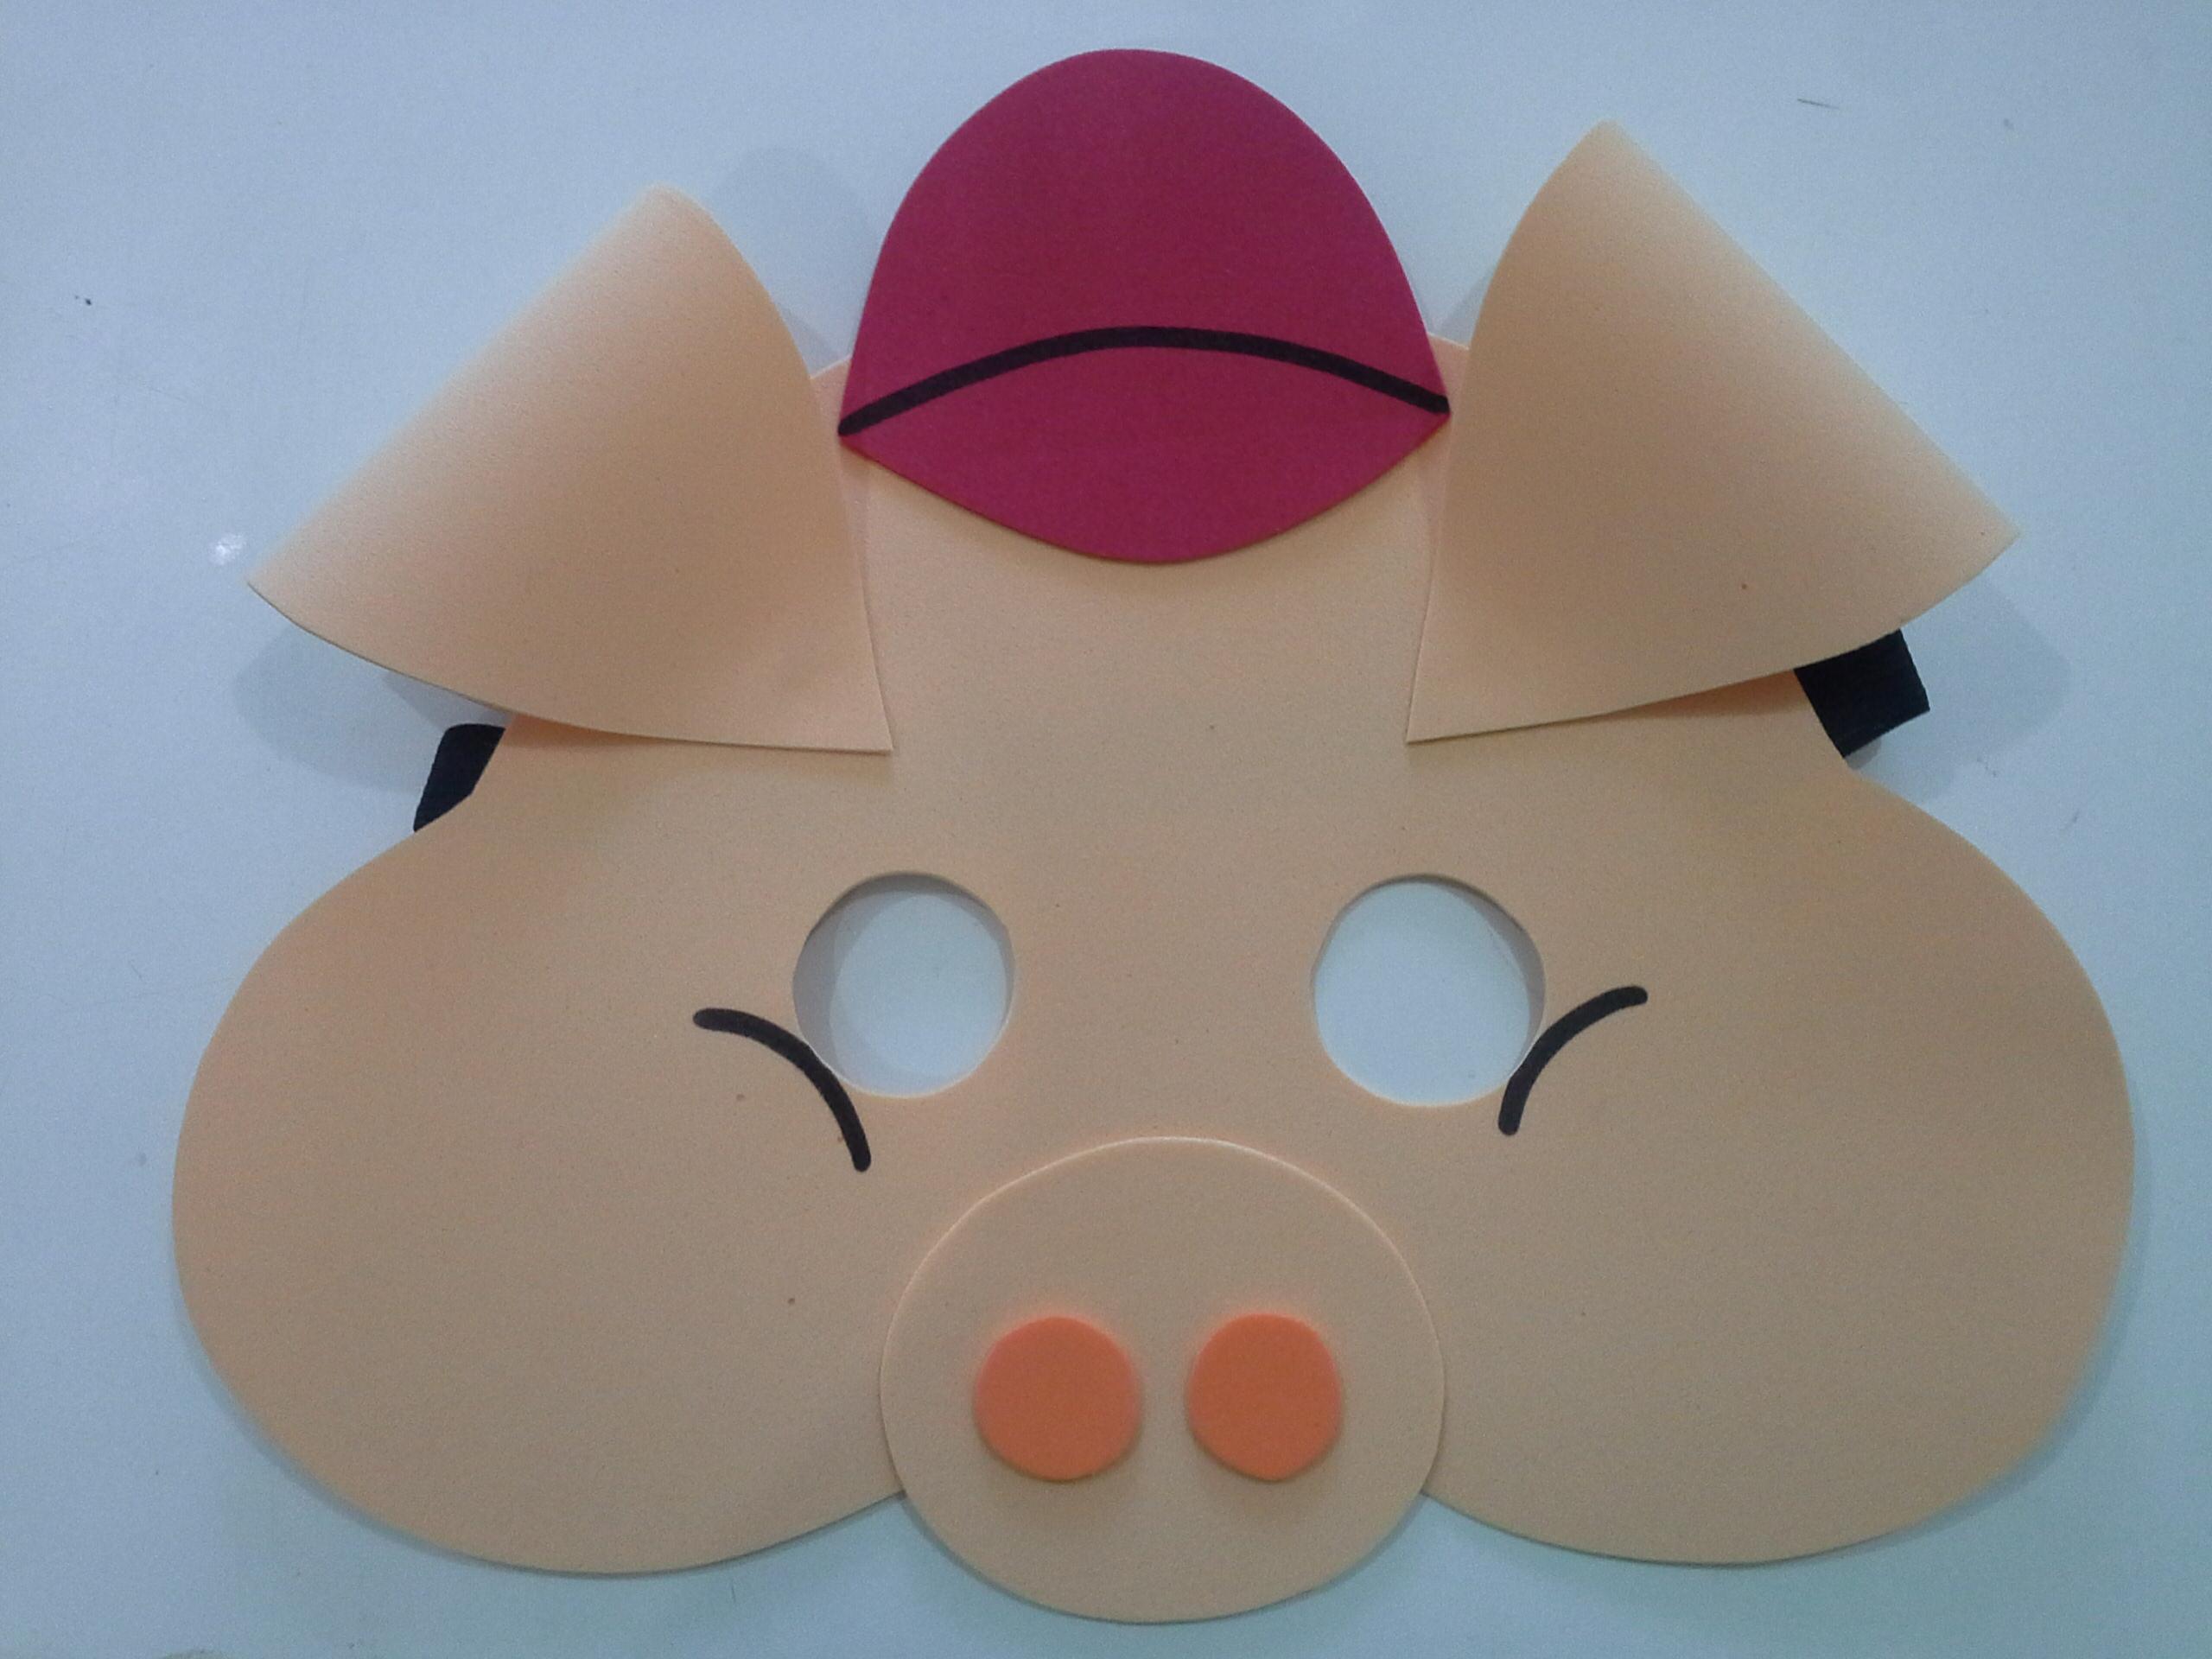 mascara-3-porquinhos-mascara-3-porquinhos mascara-3-porquinhos-mascara ...